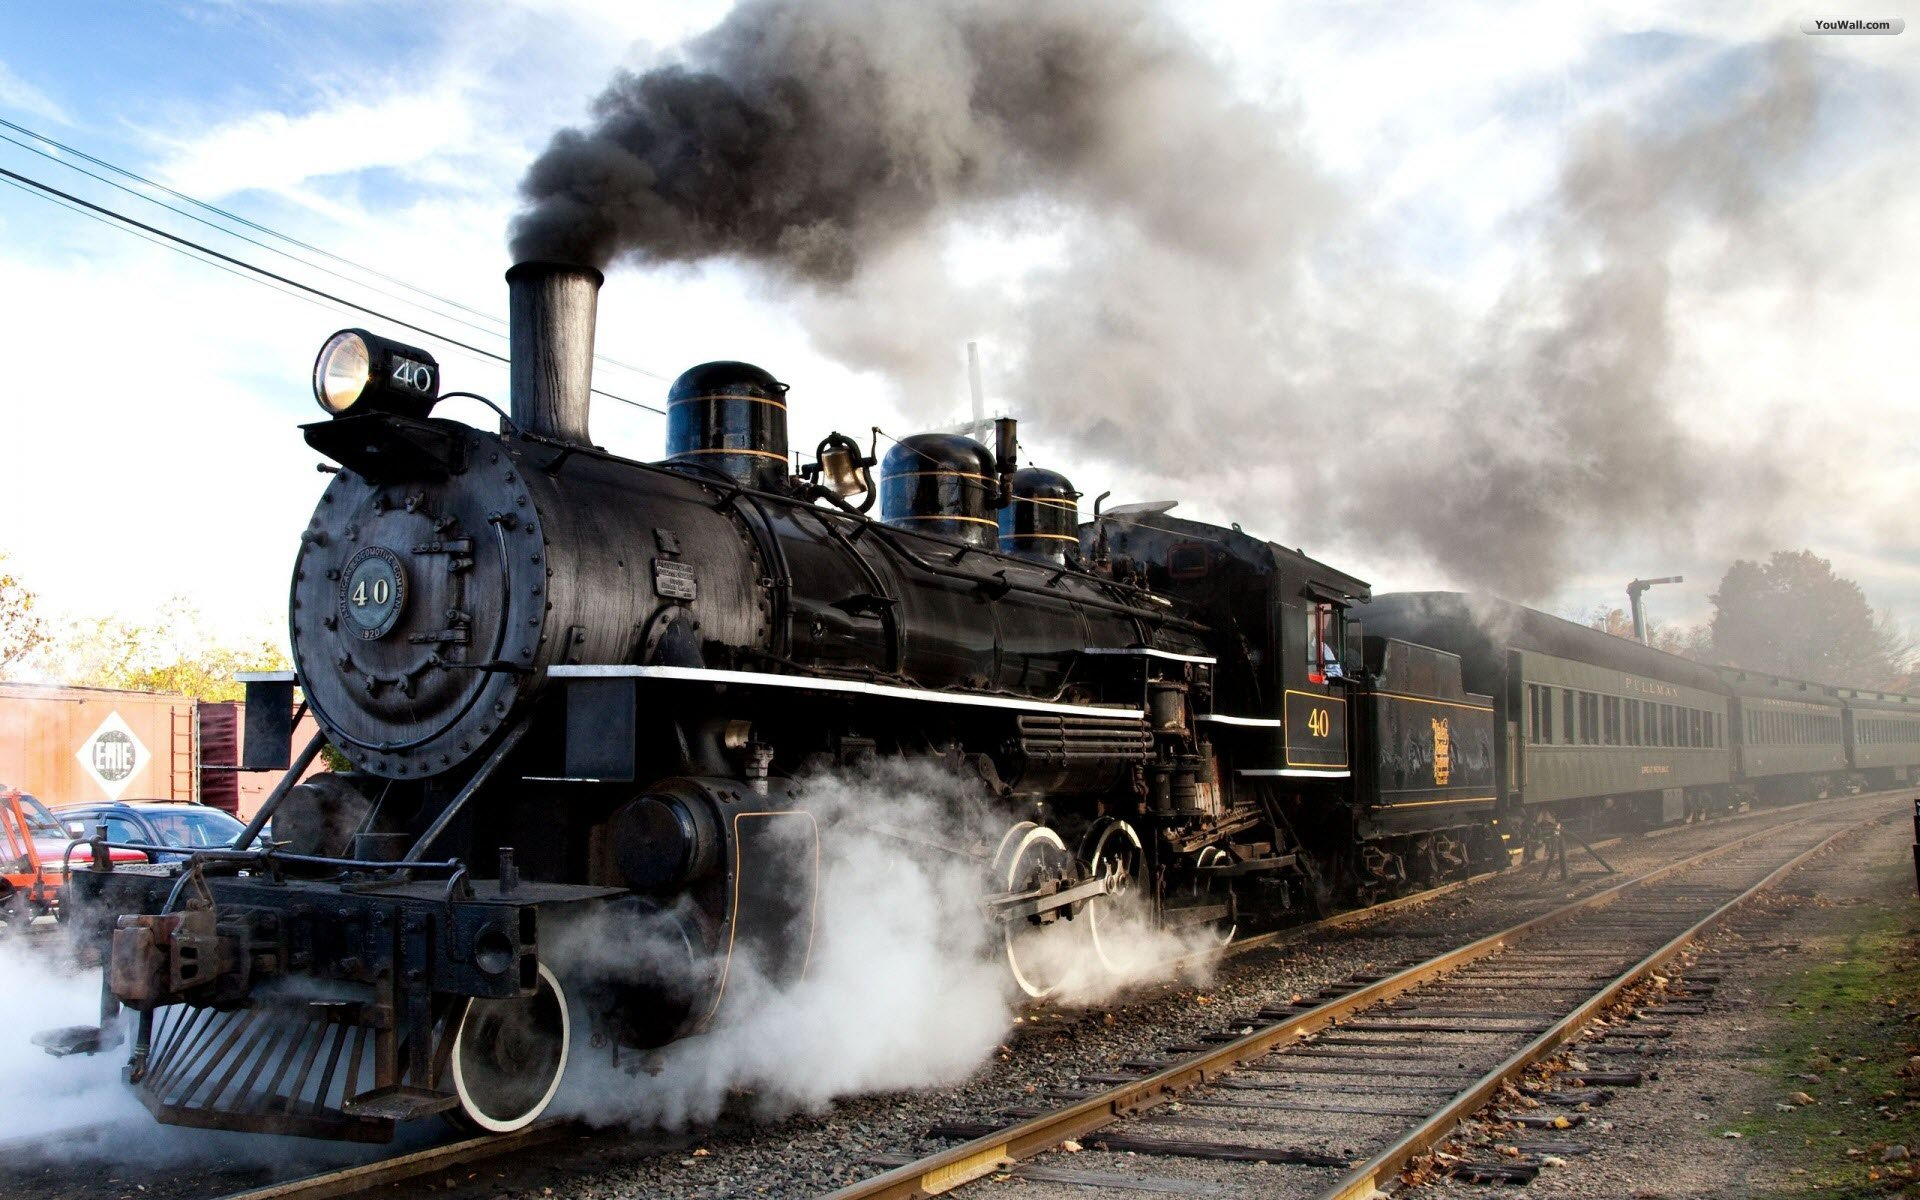 YouWall   Steam Train Wallpaper   wallpaperwallpapersfree wallpaper 1920x1200